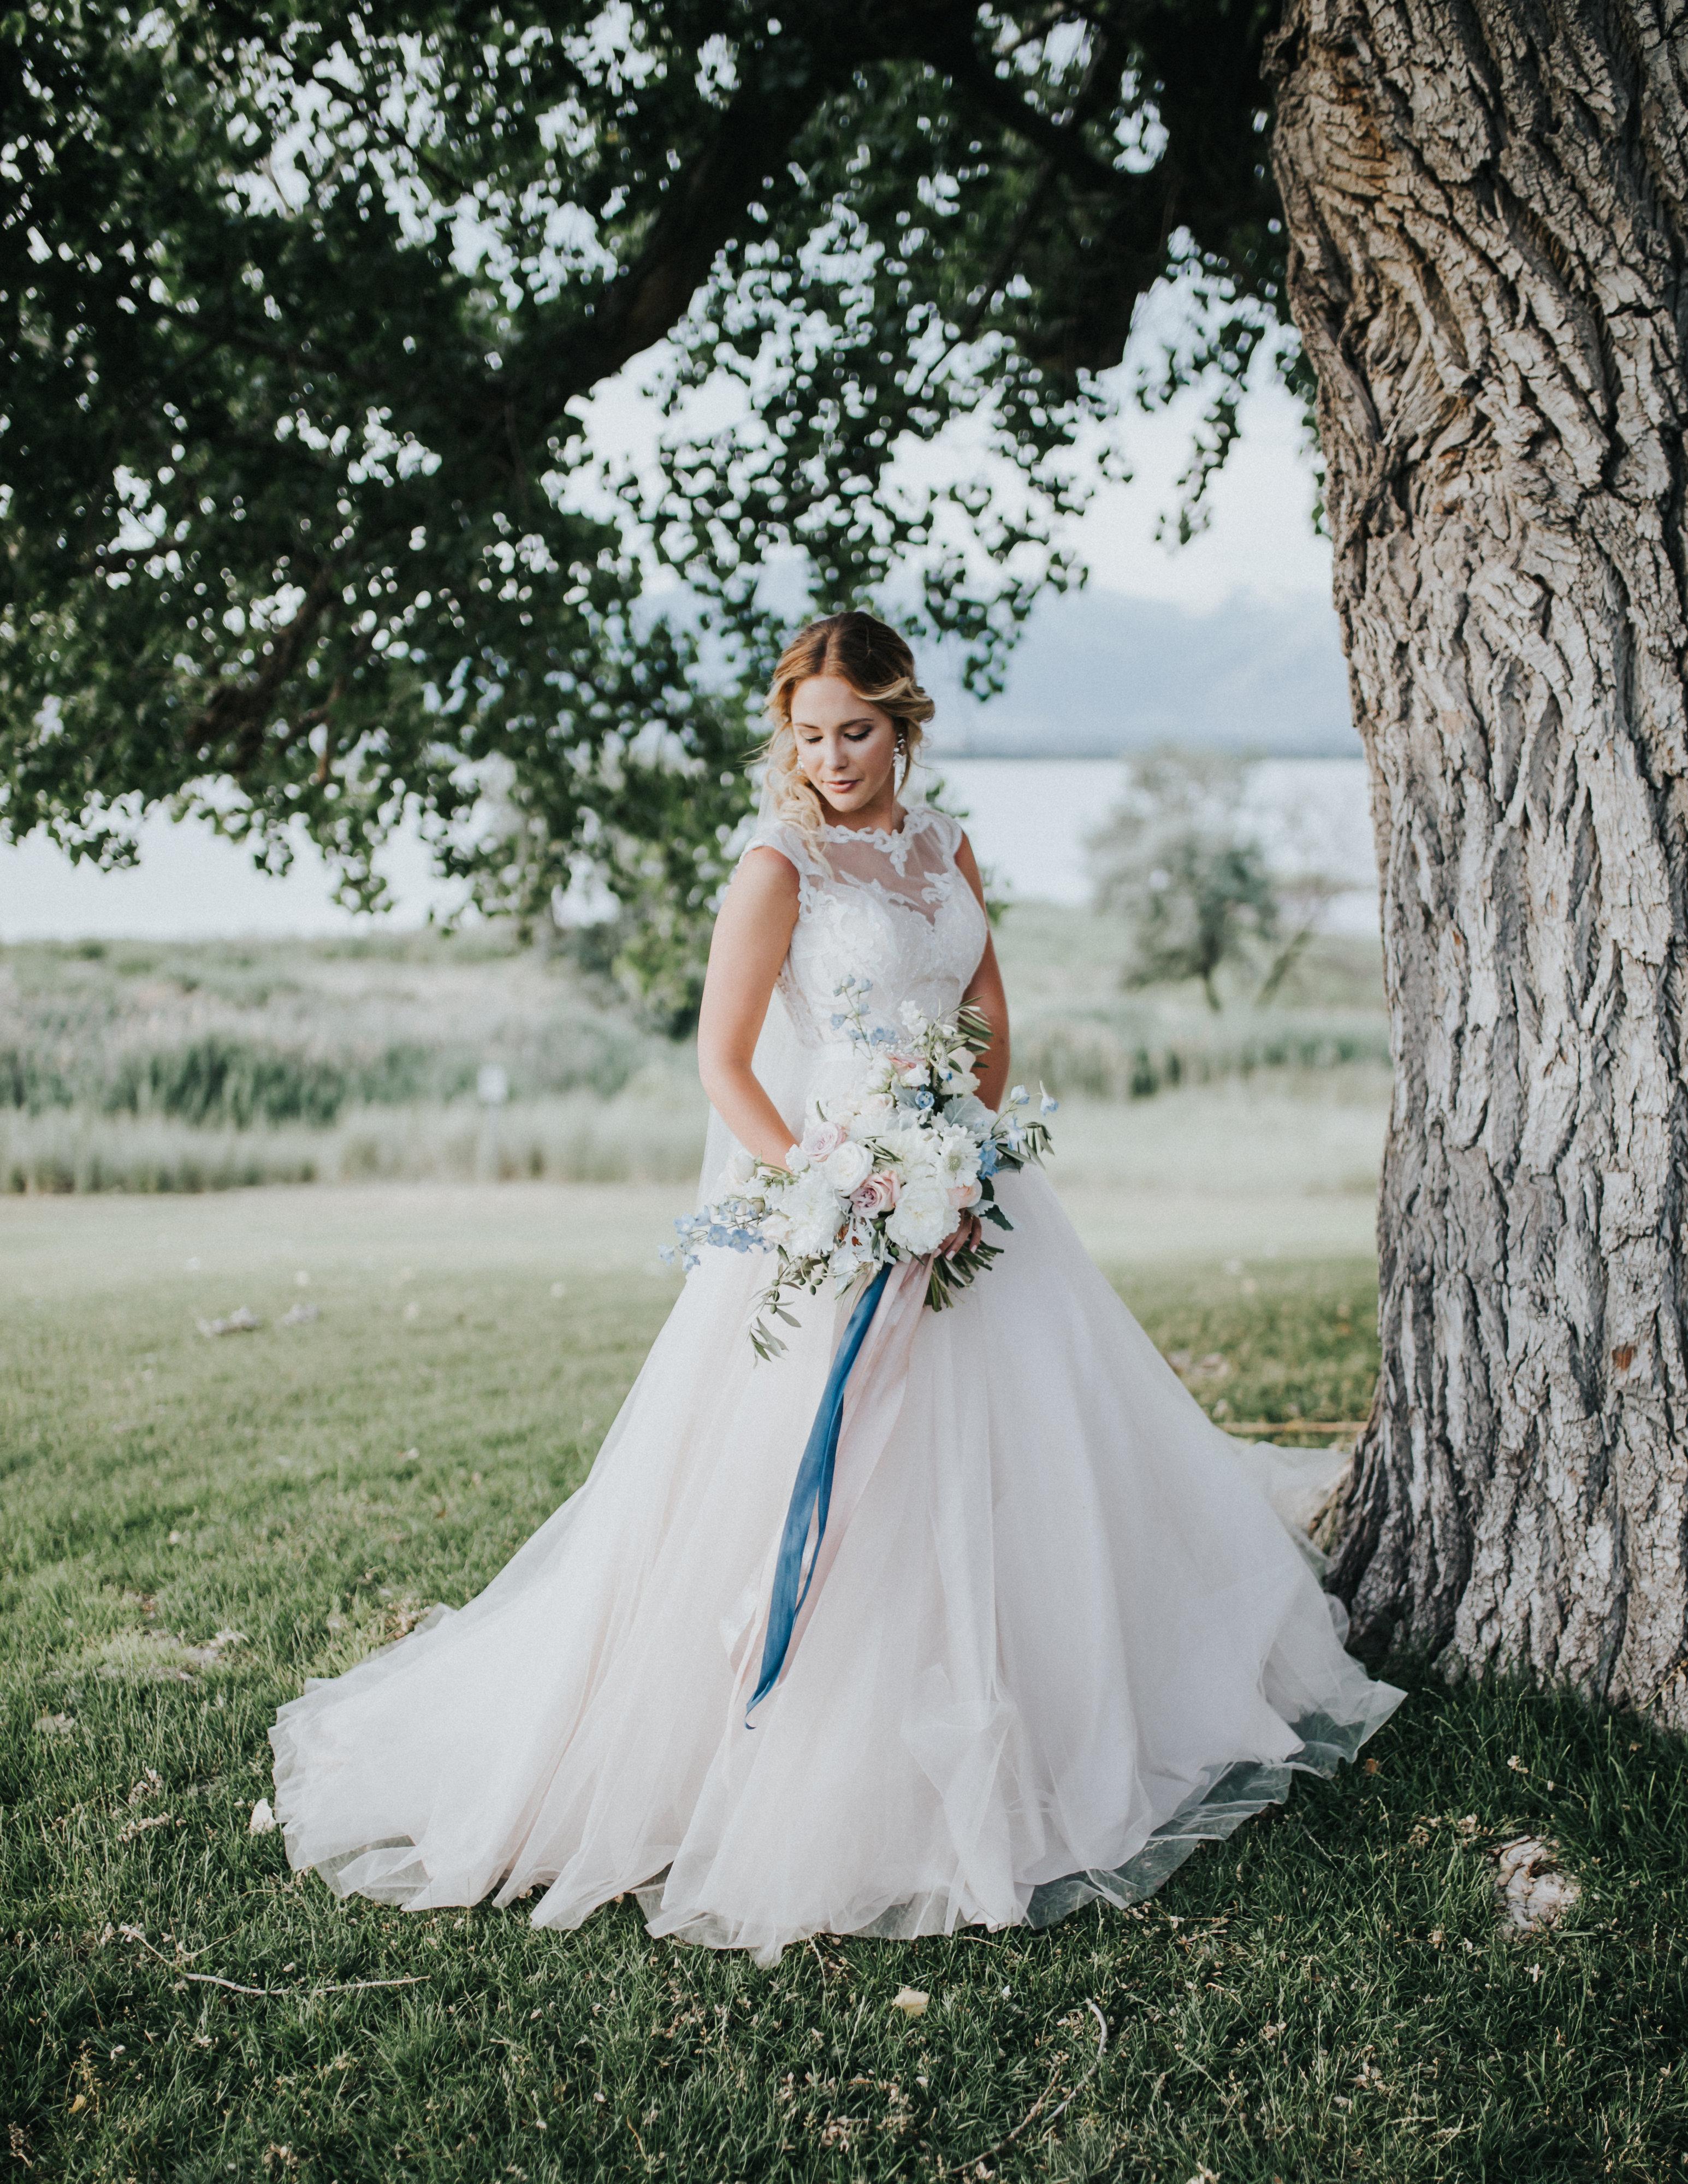 Introducing Rebecca Ingram: Elegant Wedding Dresses at Affordable ...